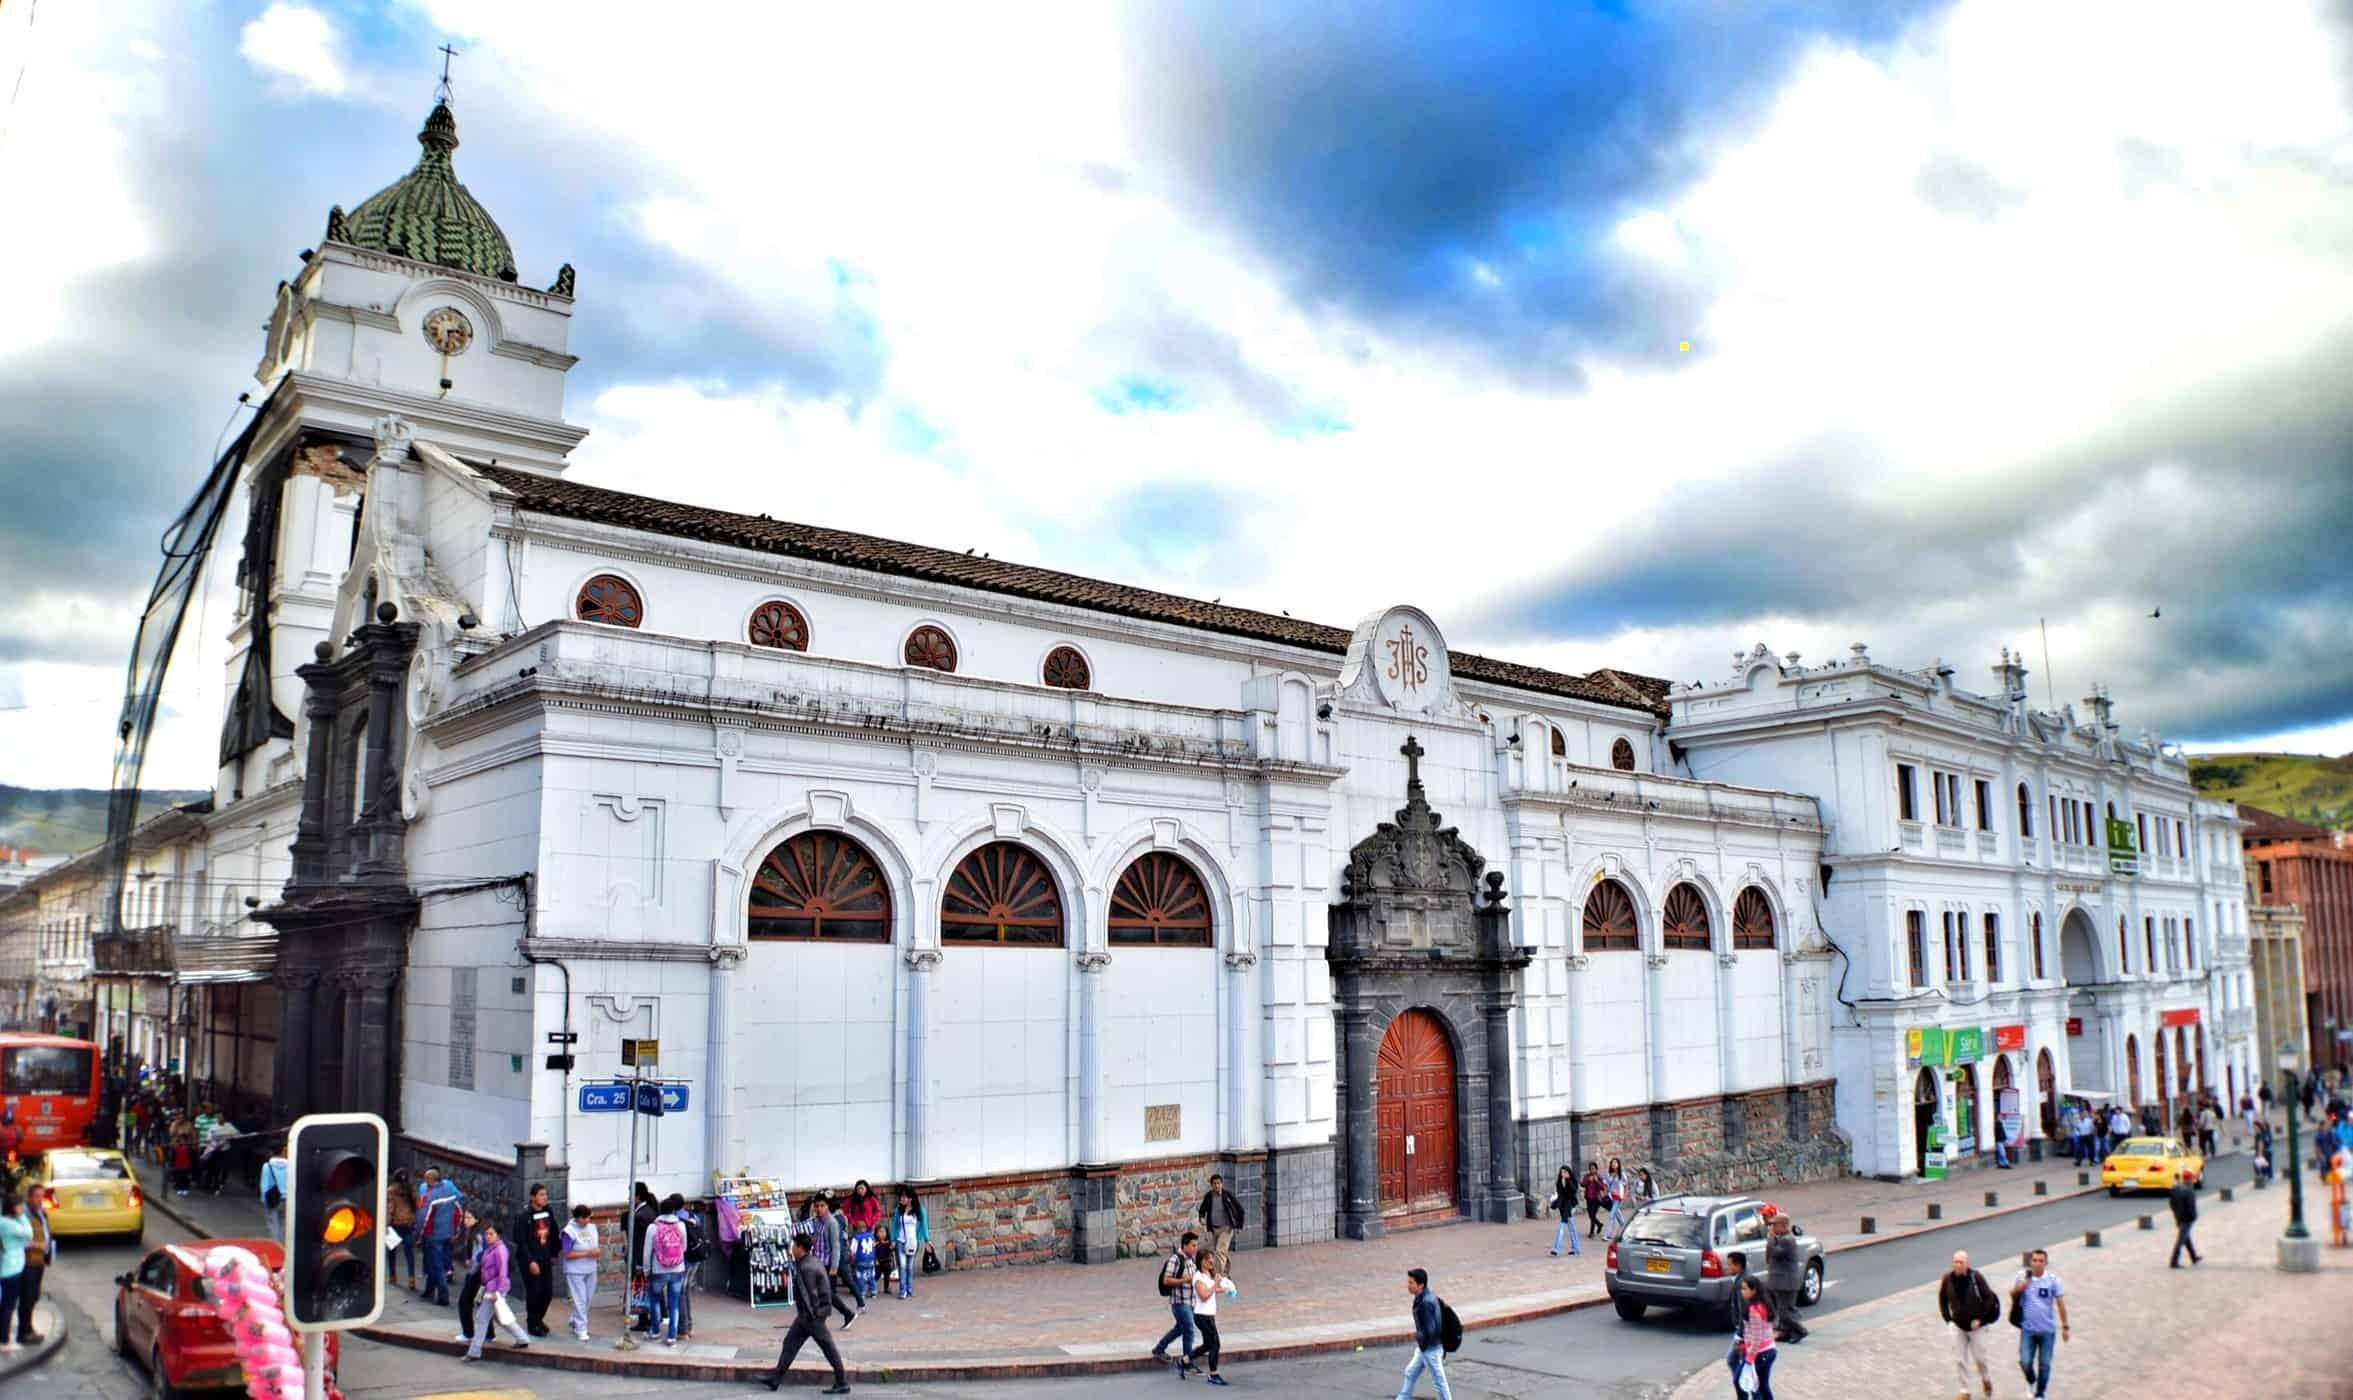 Iglesia San Juan Bautista in Pasto, Colombia